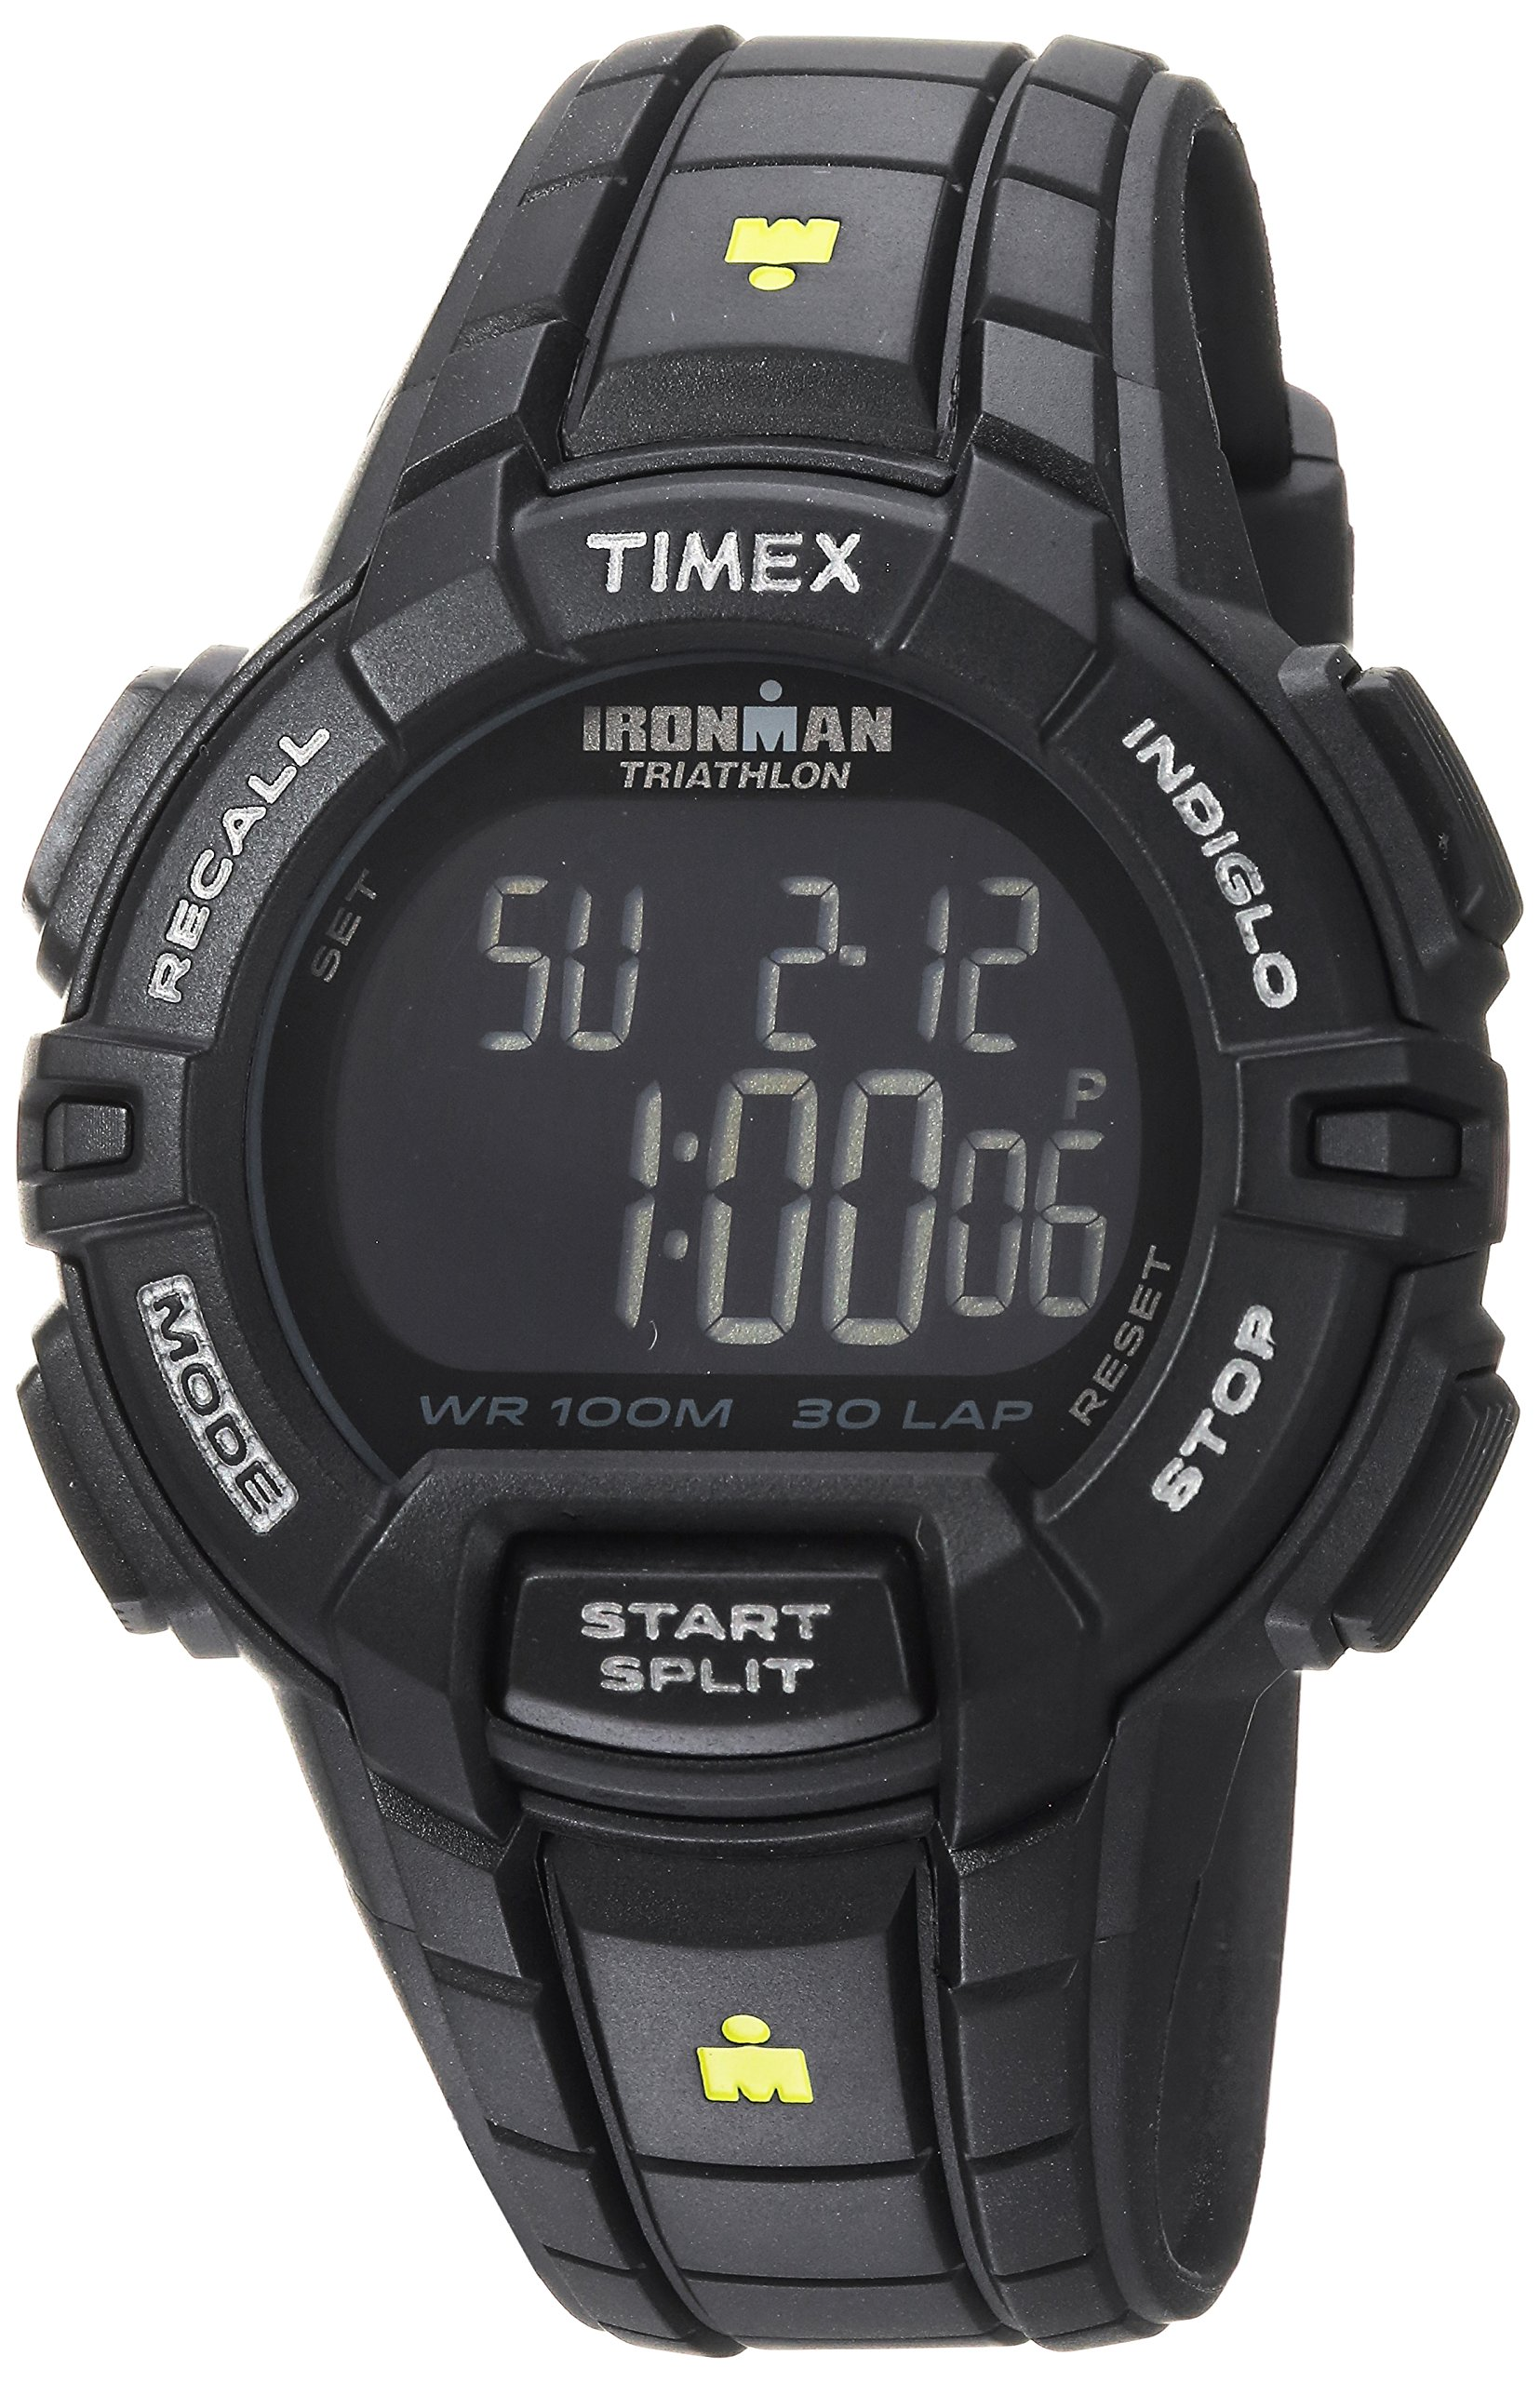 Timex Ironman Rugged Full Size Watch